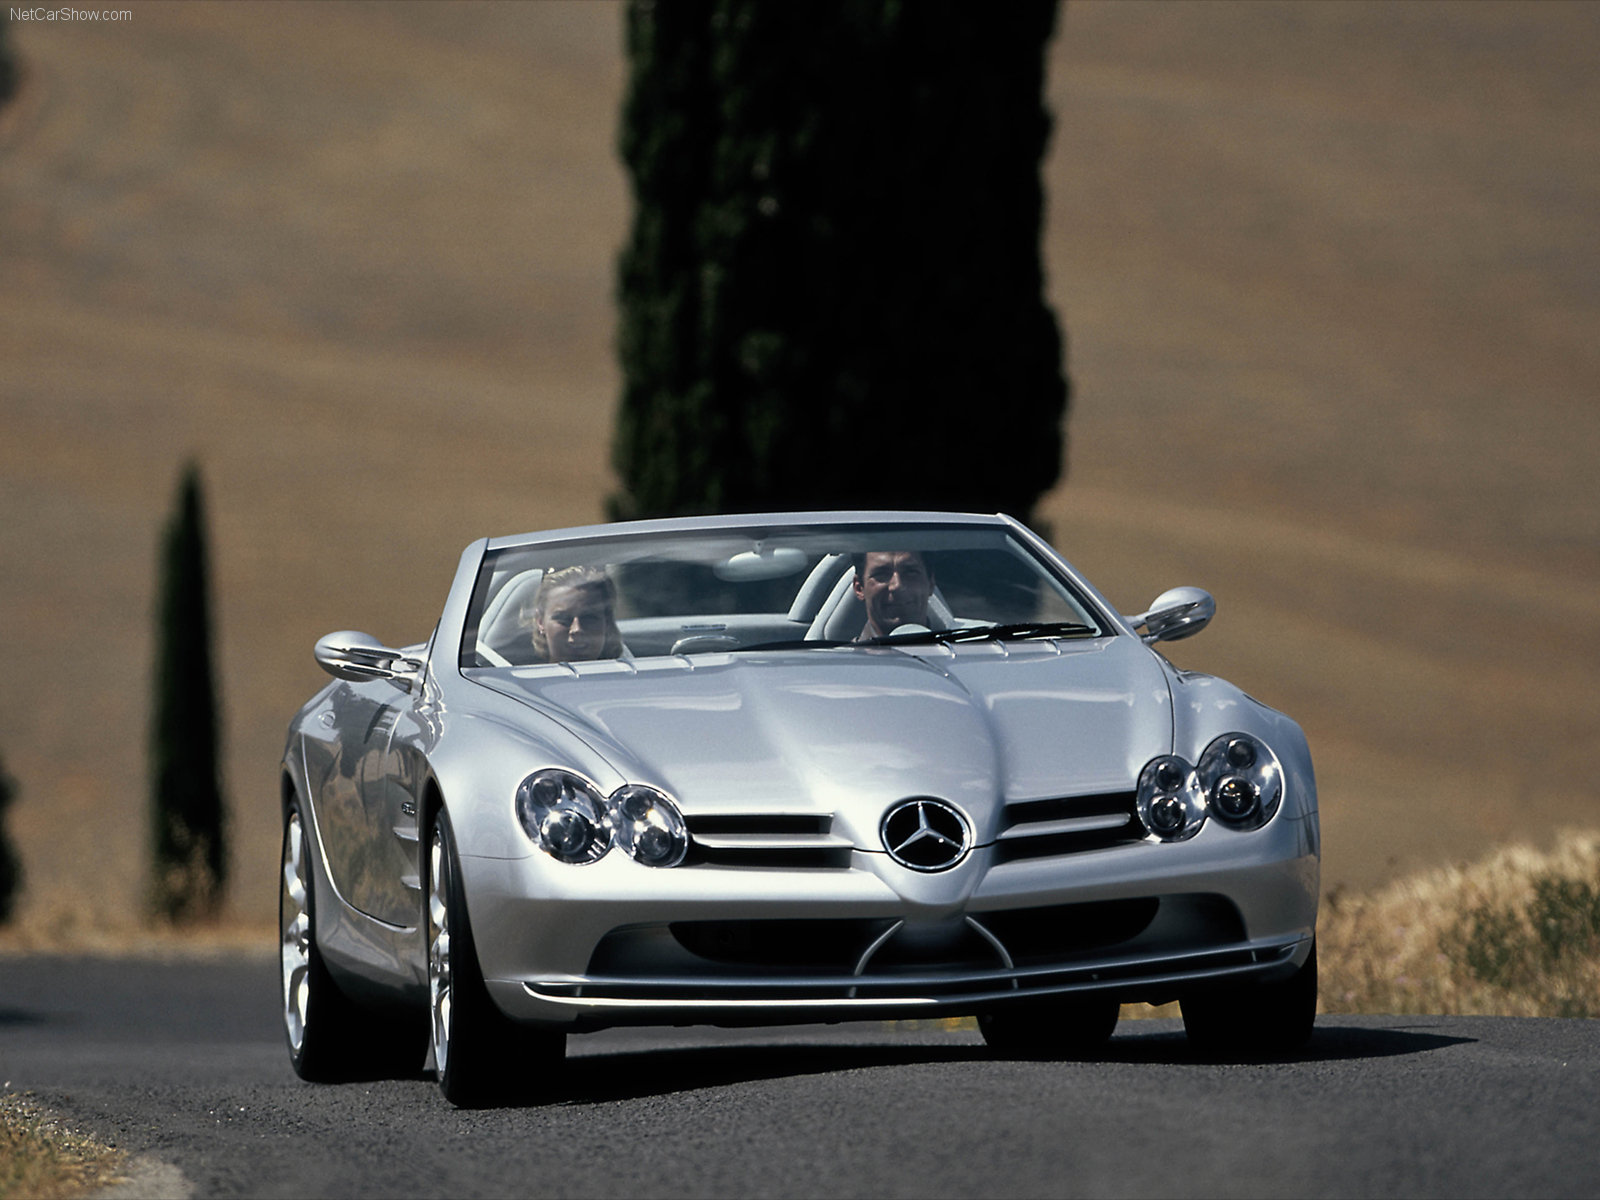 Mercedes benz vision slr picture 37153 mercedes benz for Mercedes benz vision